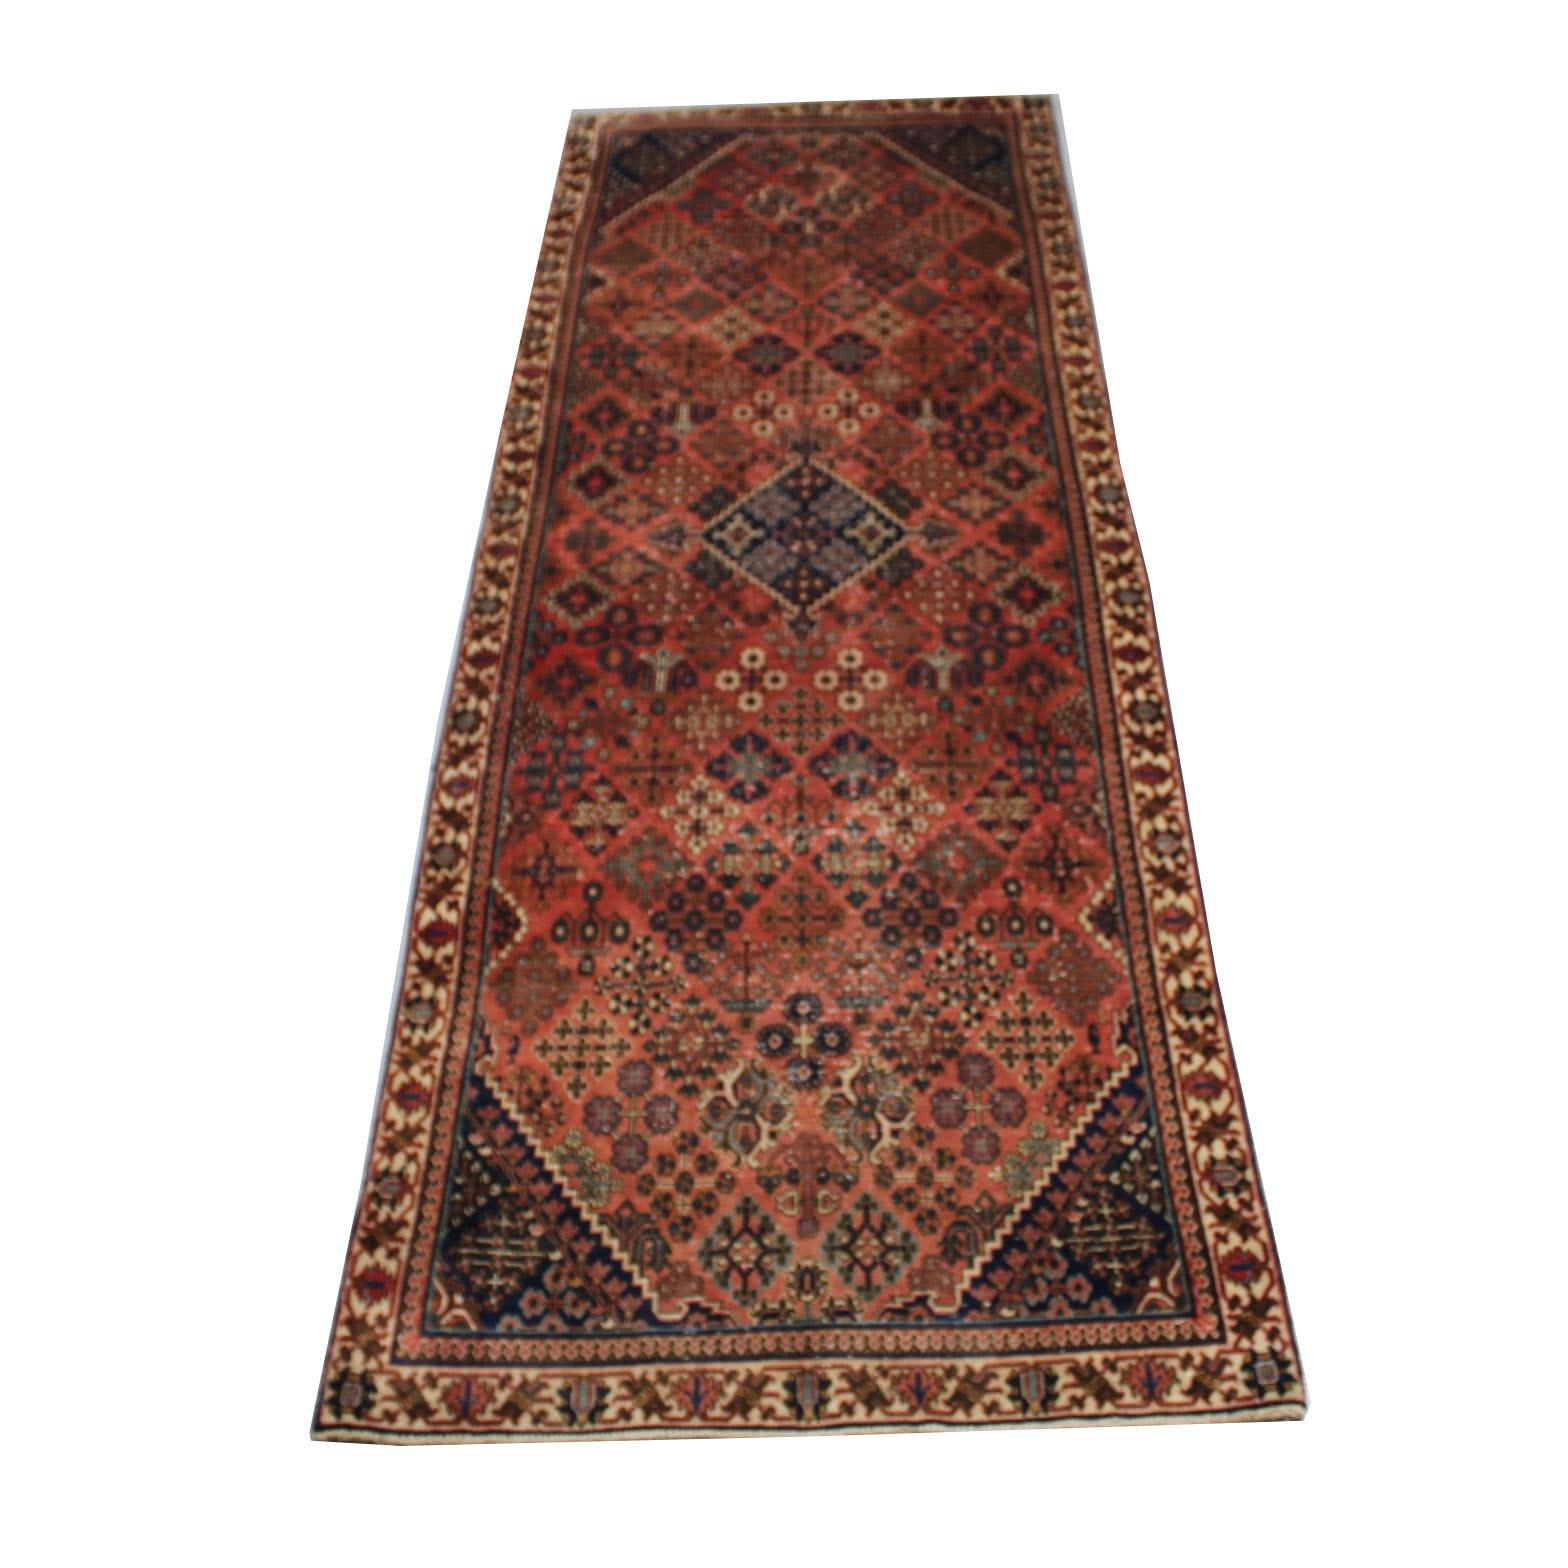 Vintage Hand-Knotted Persian Josheghan Carpet Runner